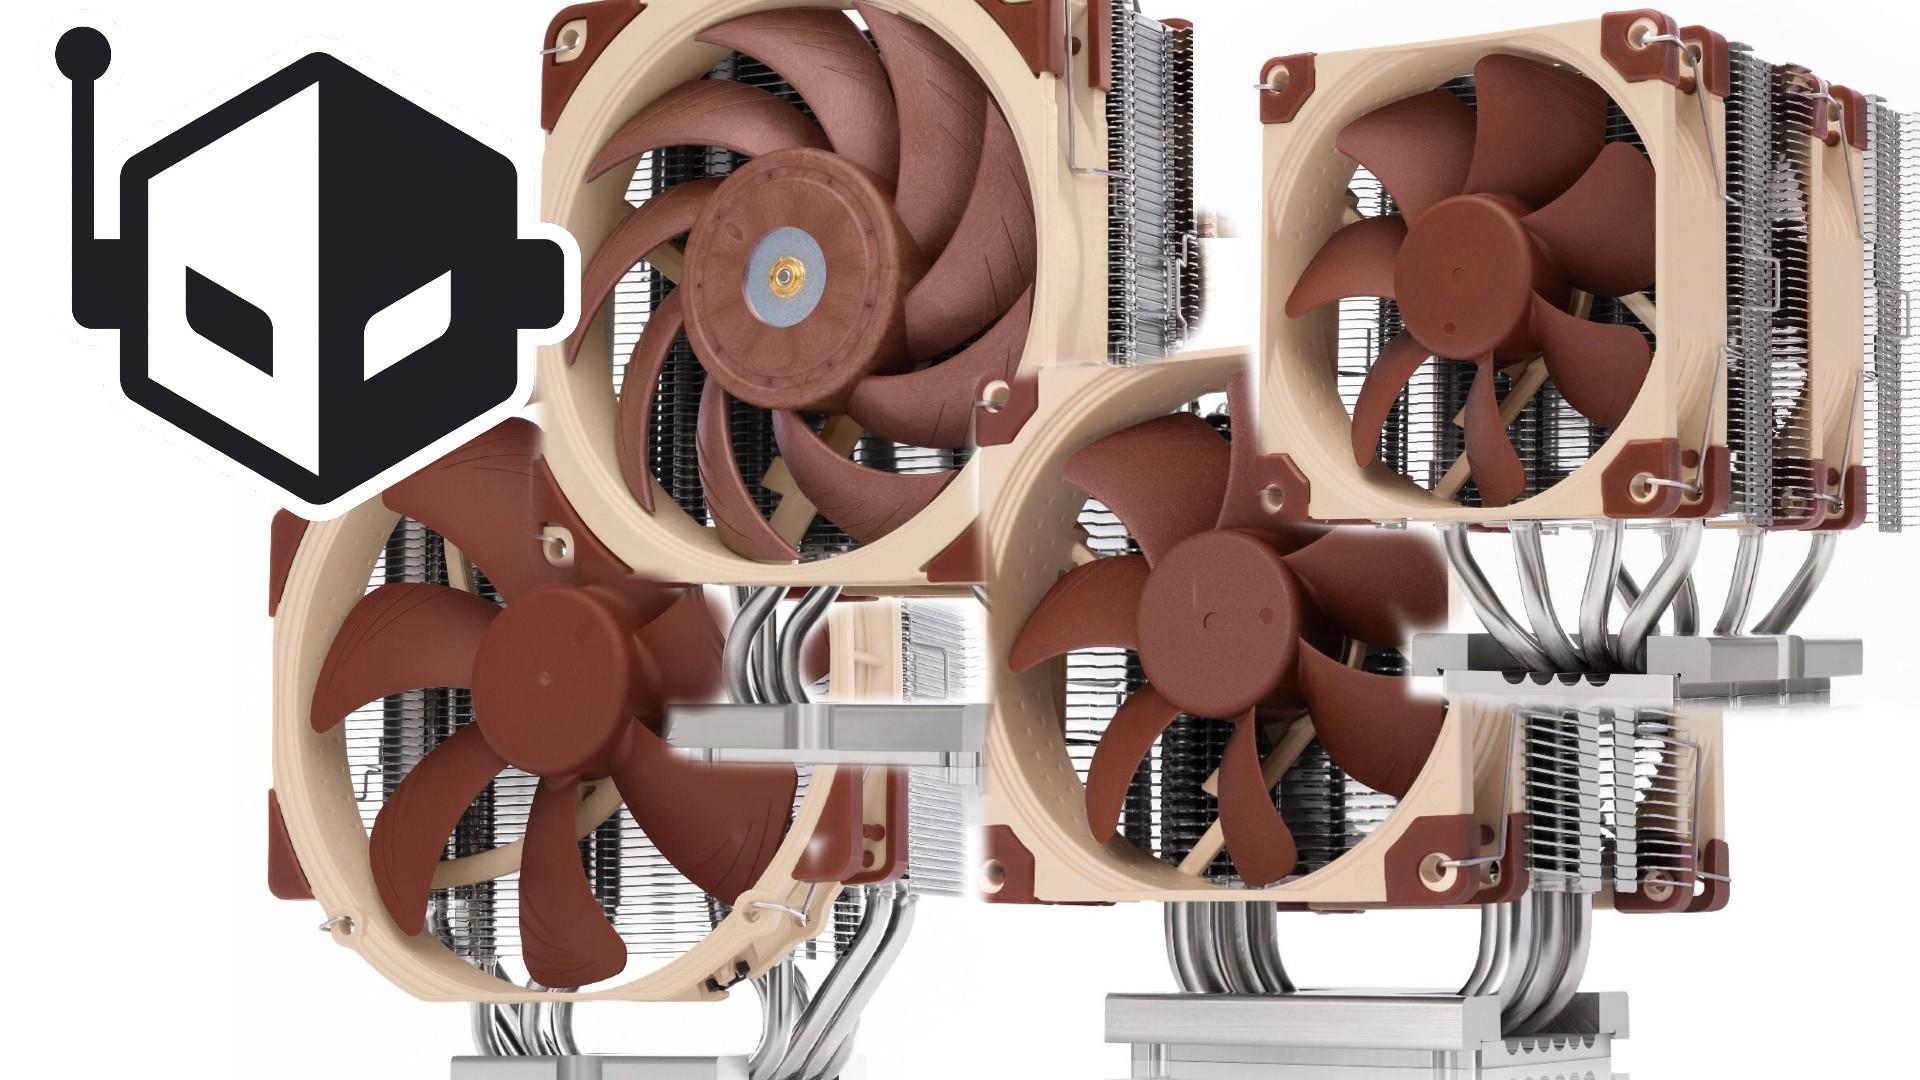 Noctua Announces New CPU Coolers for Intel's LGA4189 Xeon Platform